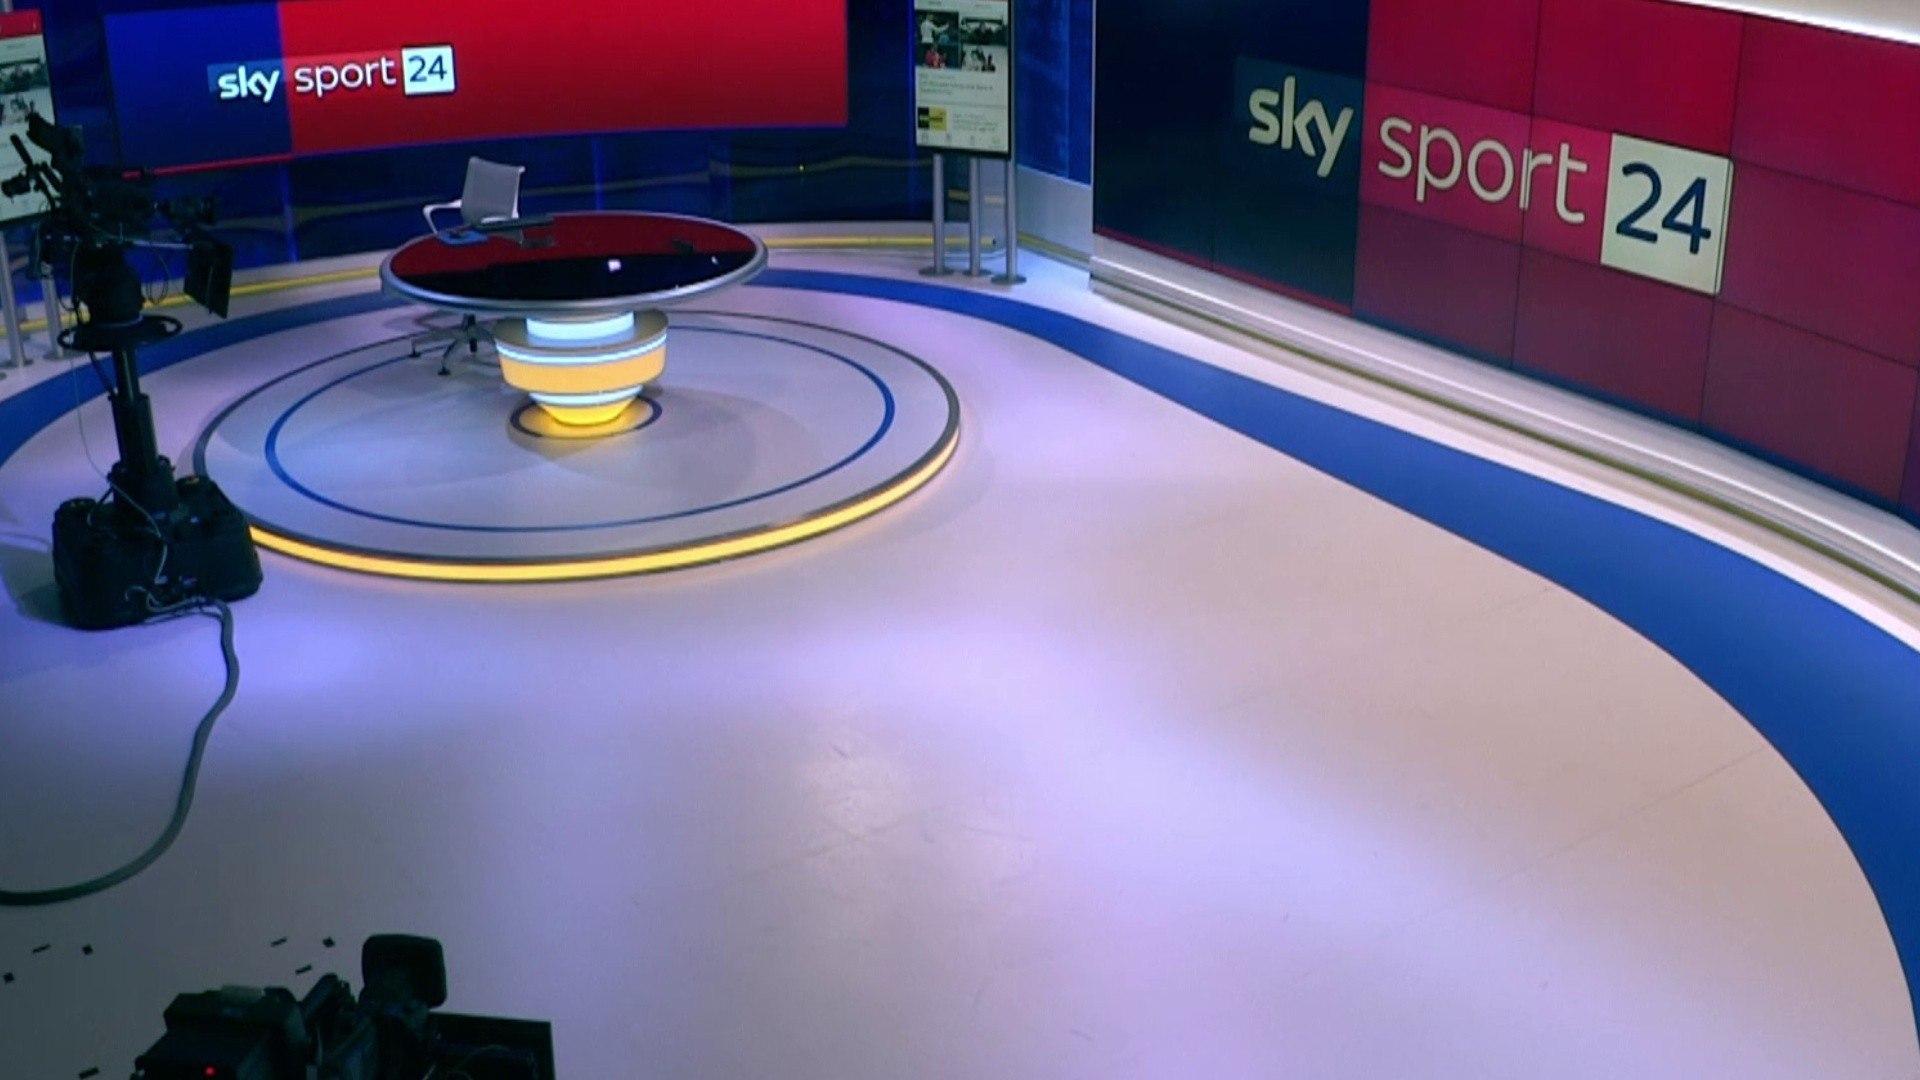 Sky Sport24 Sky Giro 24